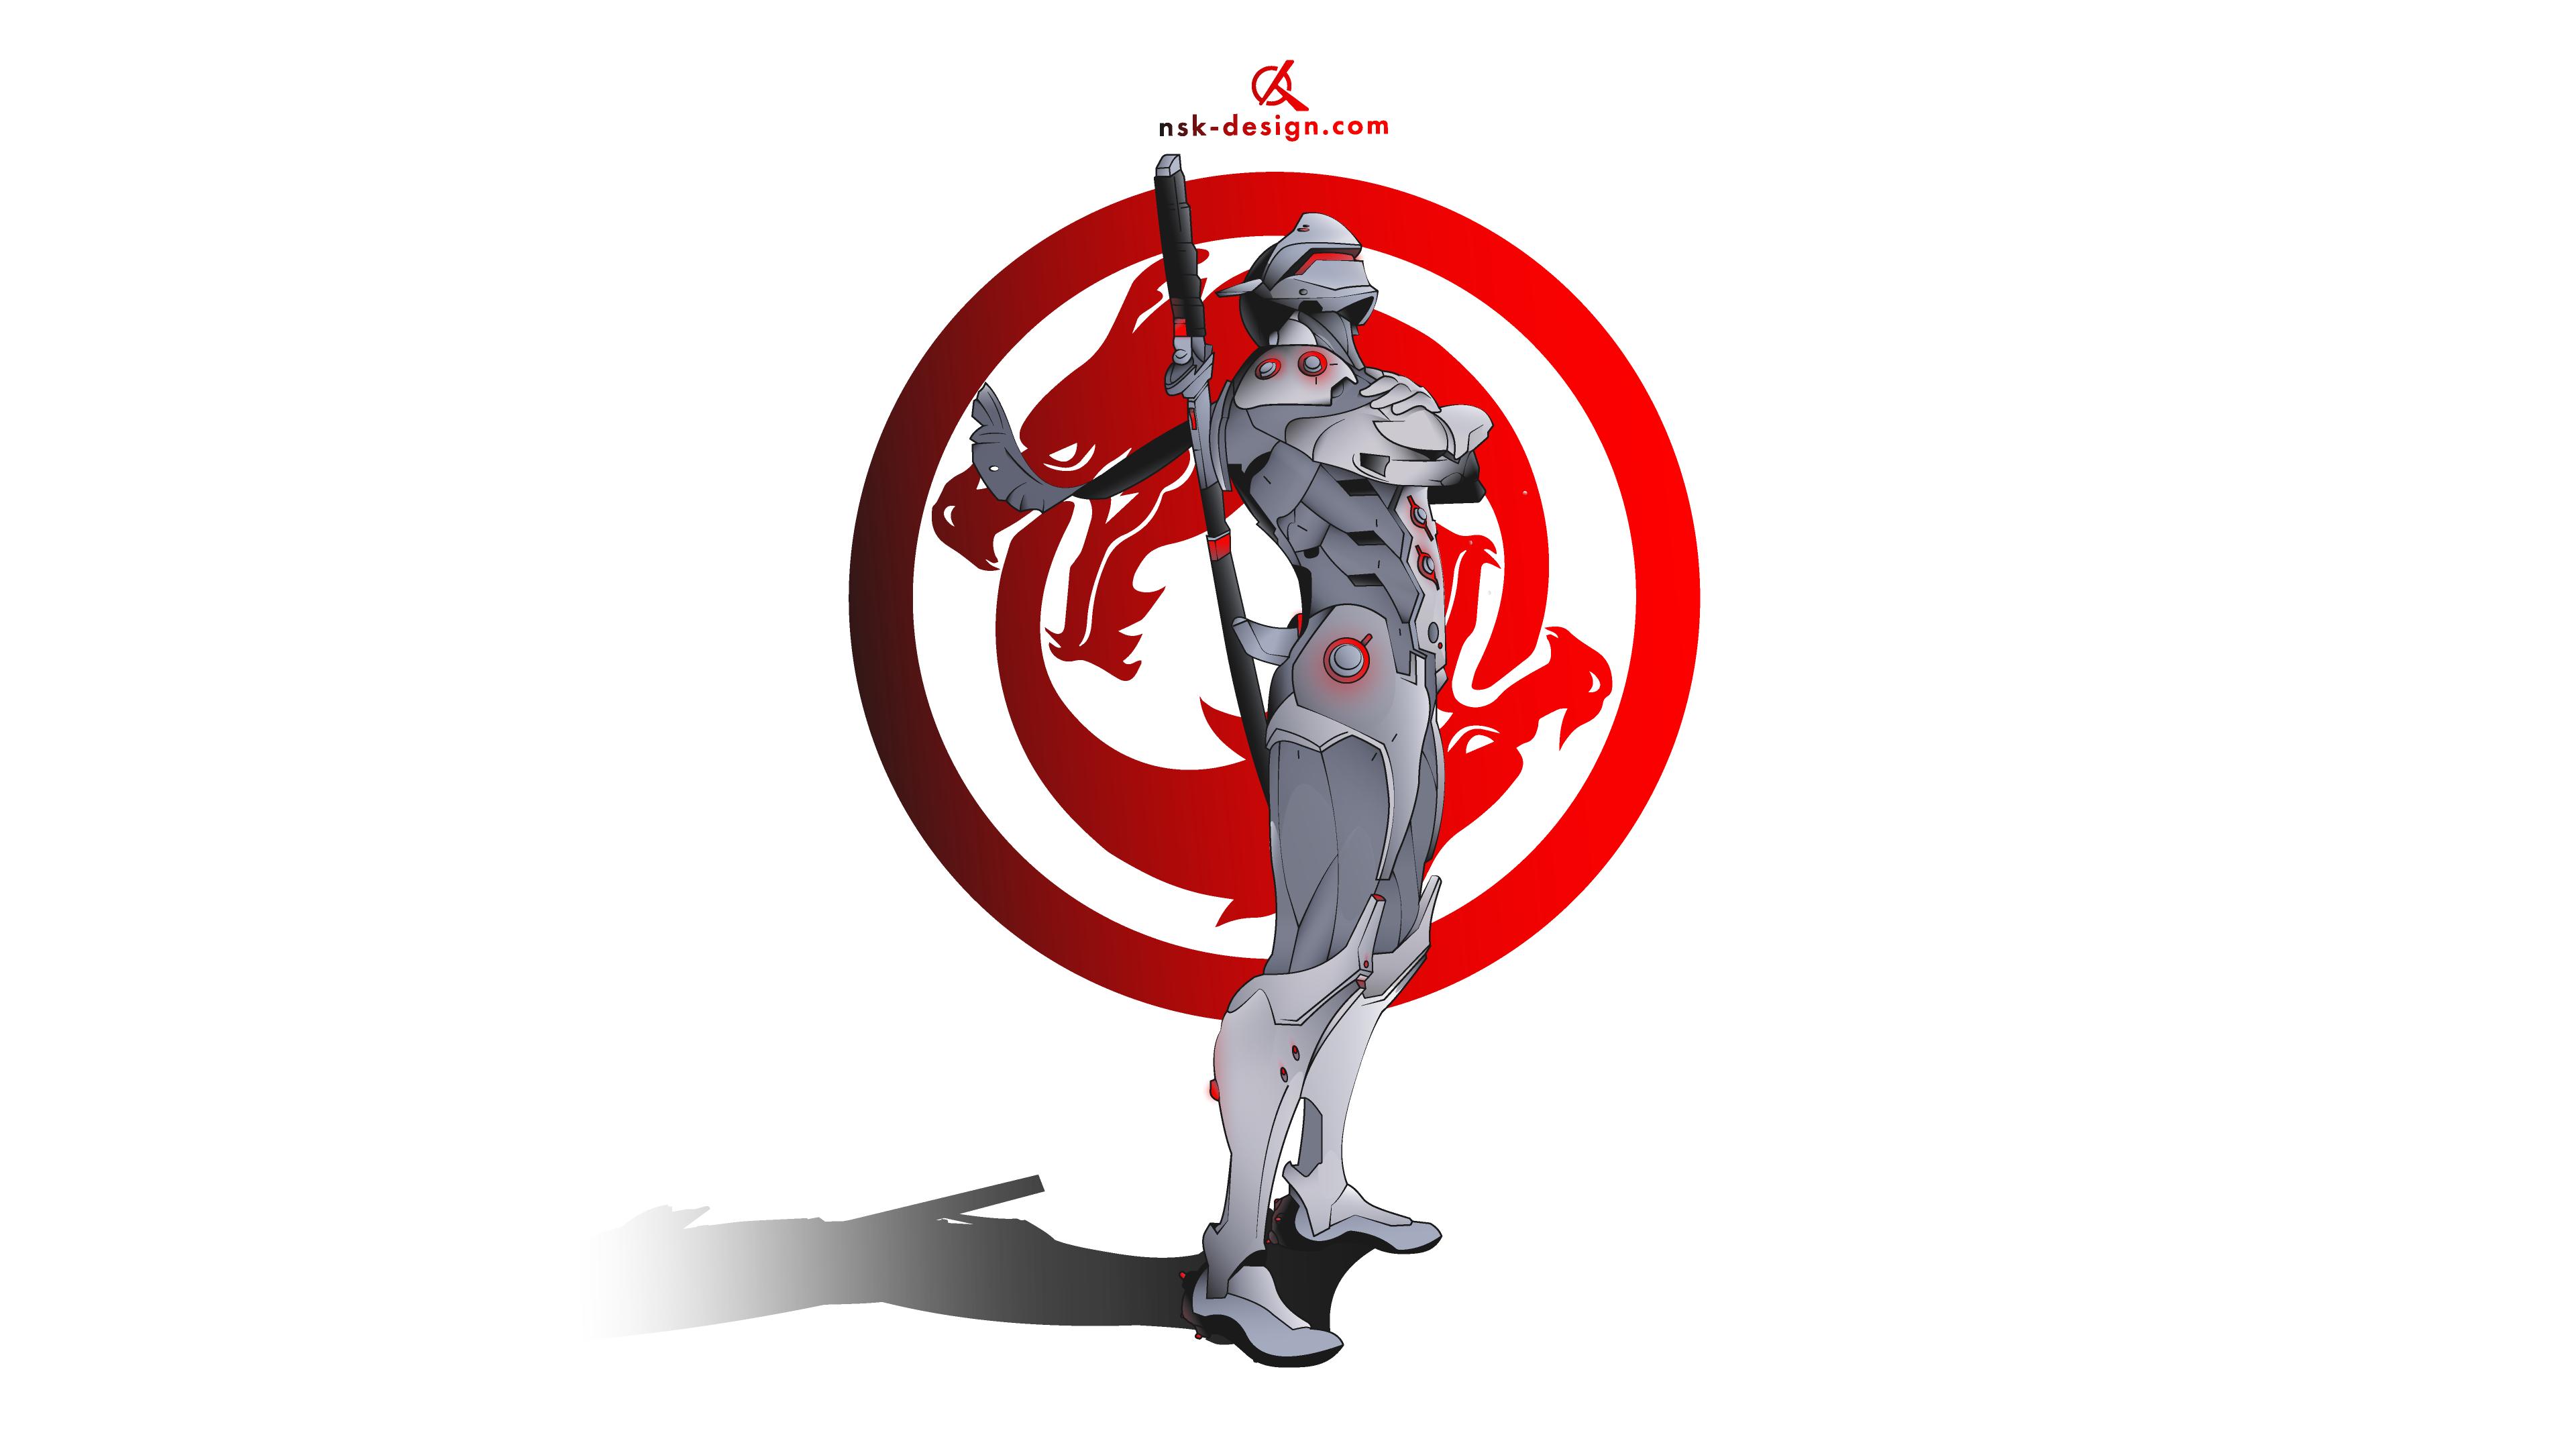 General 3840x2160 Overwatch vector graphics minimalism Genji Genji (Overwatch) Blizzard Entertainment illustration Genji Shimada vector dragon